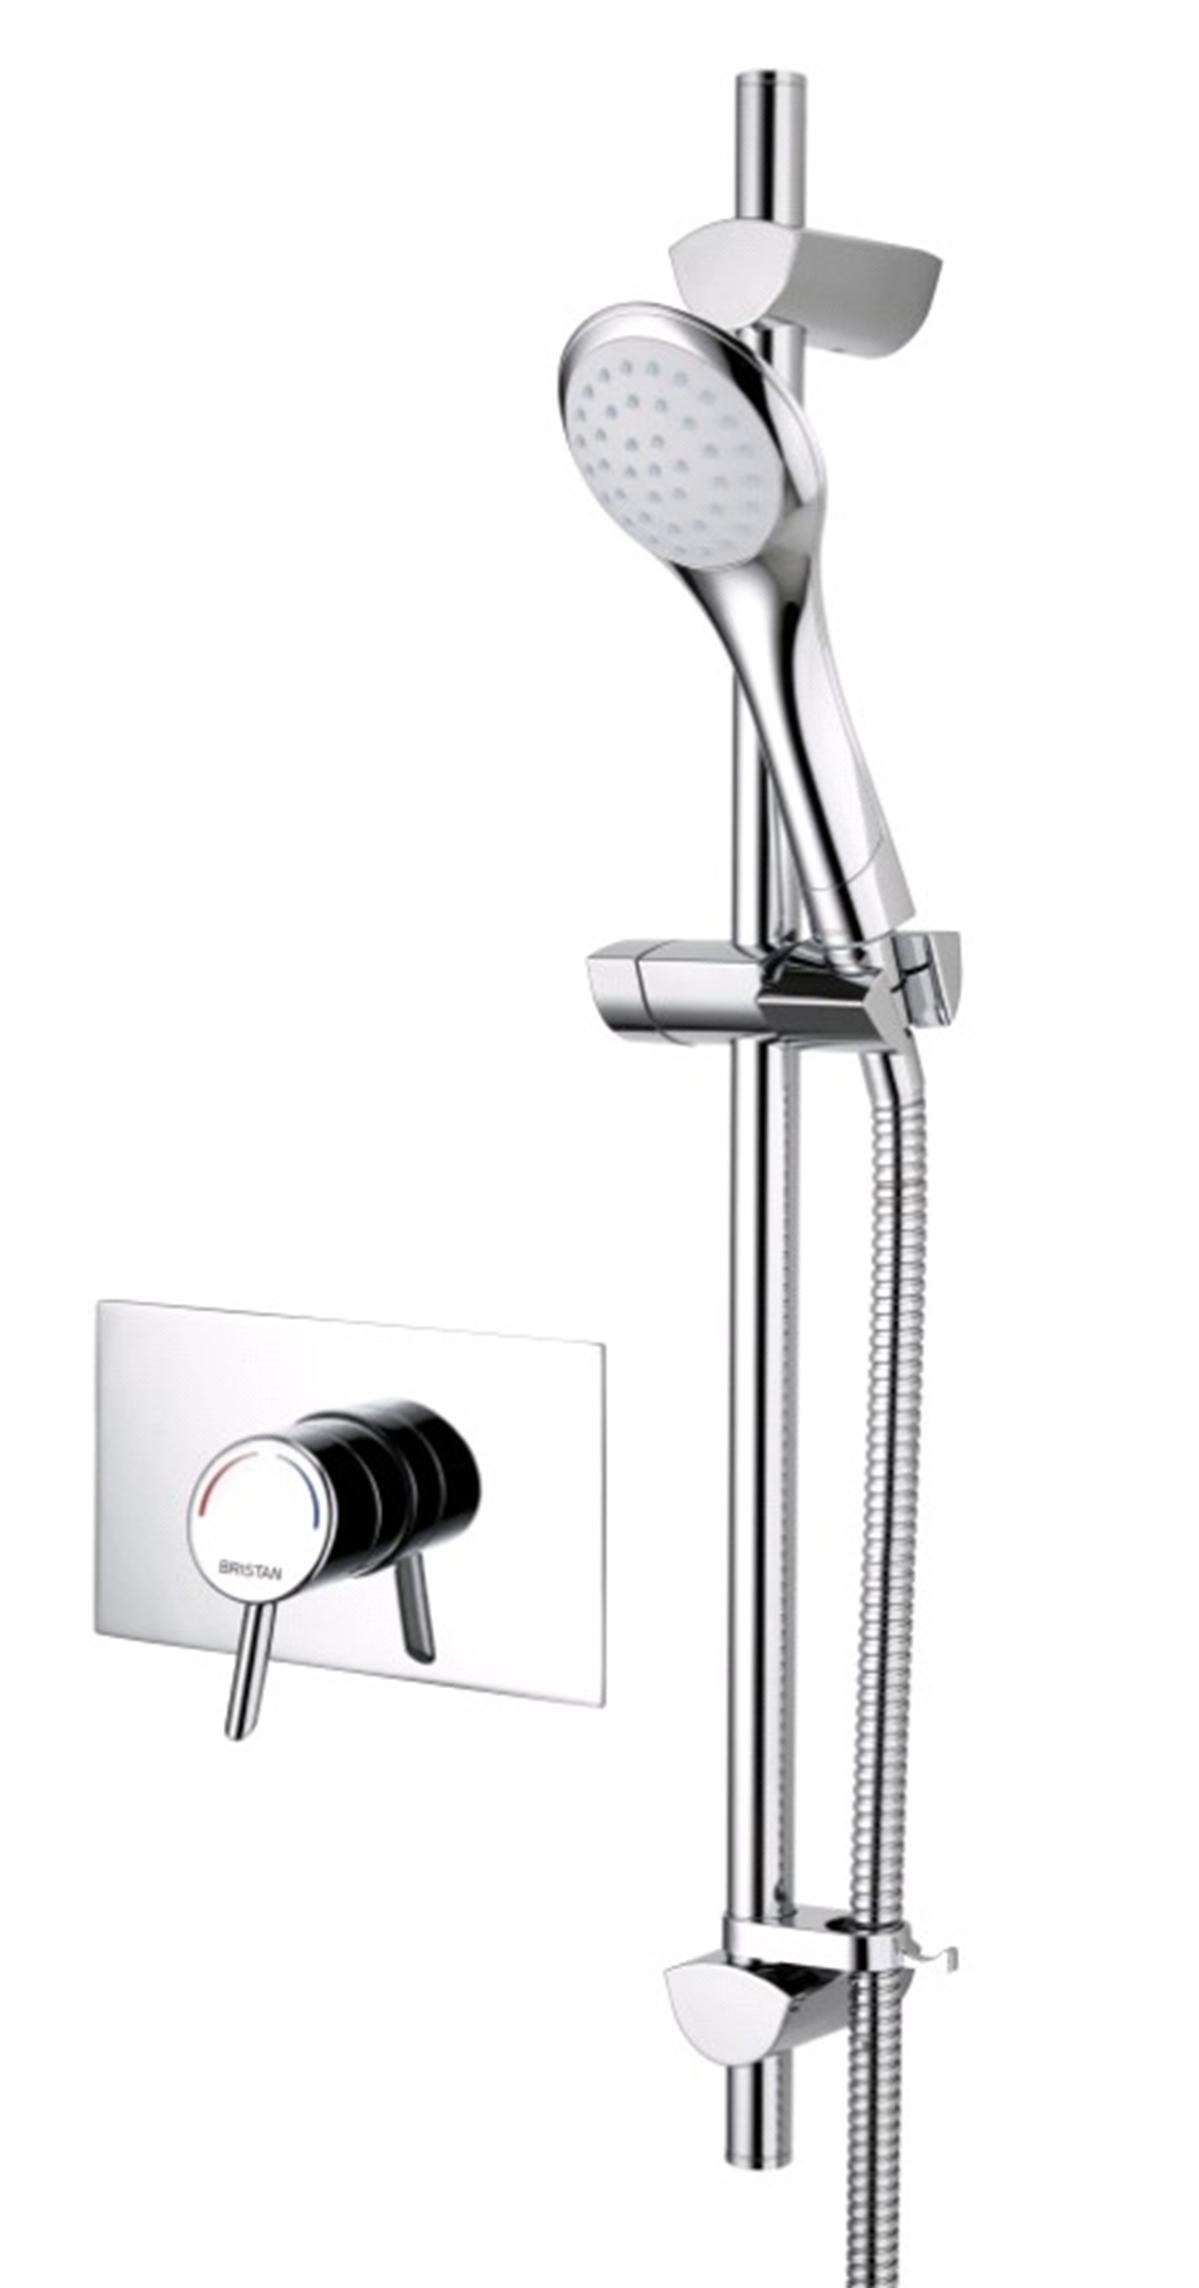 Bristan   Acute   AE SHCAR C   Complete Shower